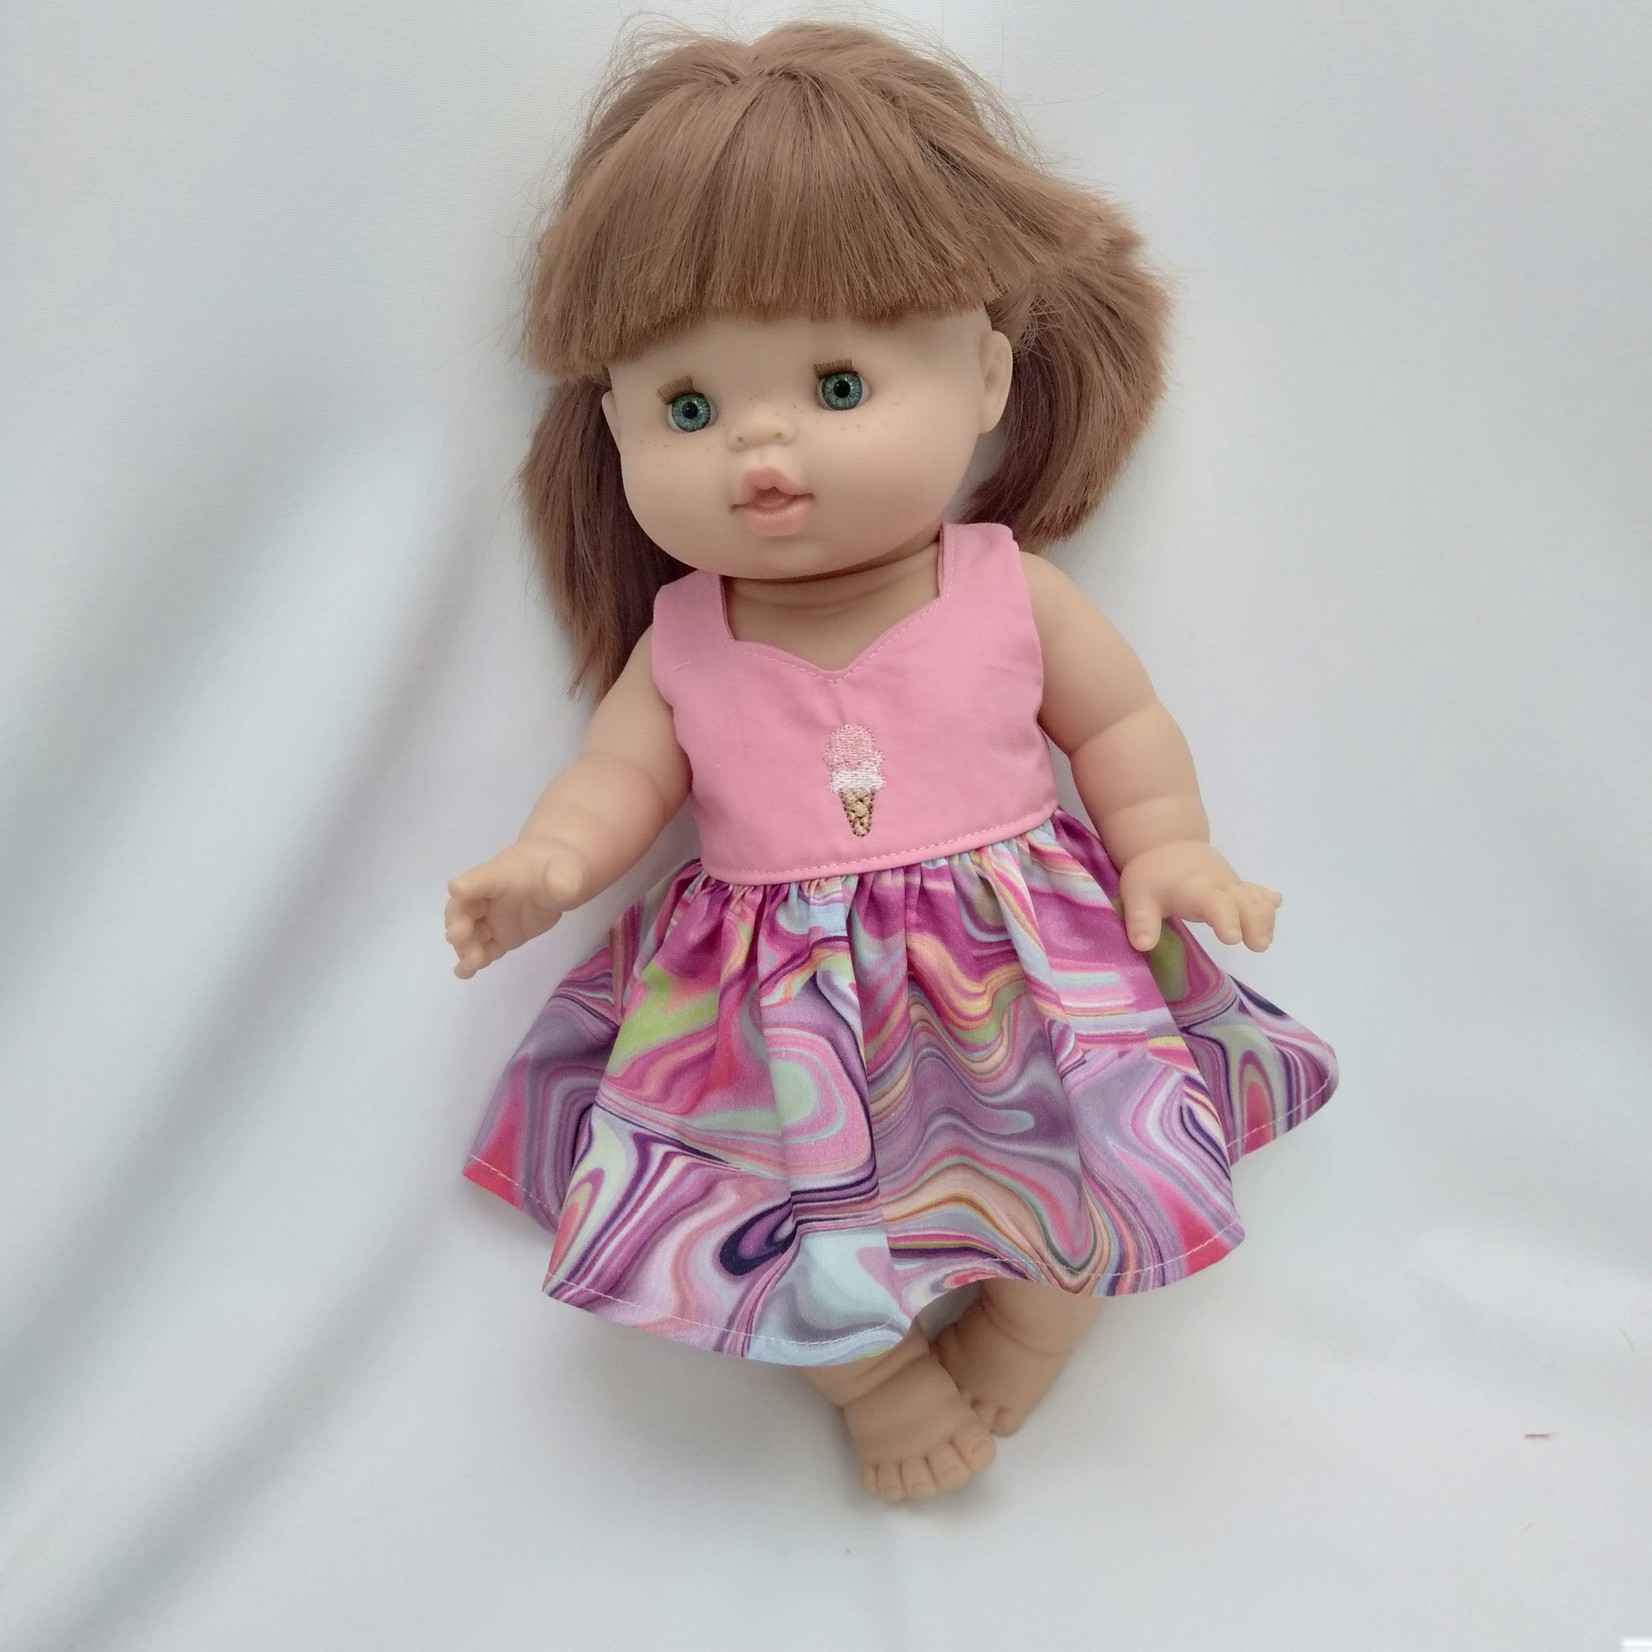 Wacky Wardrobe Wacky Wardrobe 38cm Doll Dress Deluxe